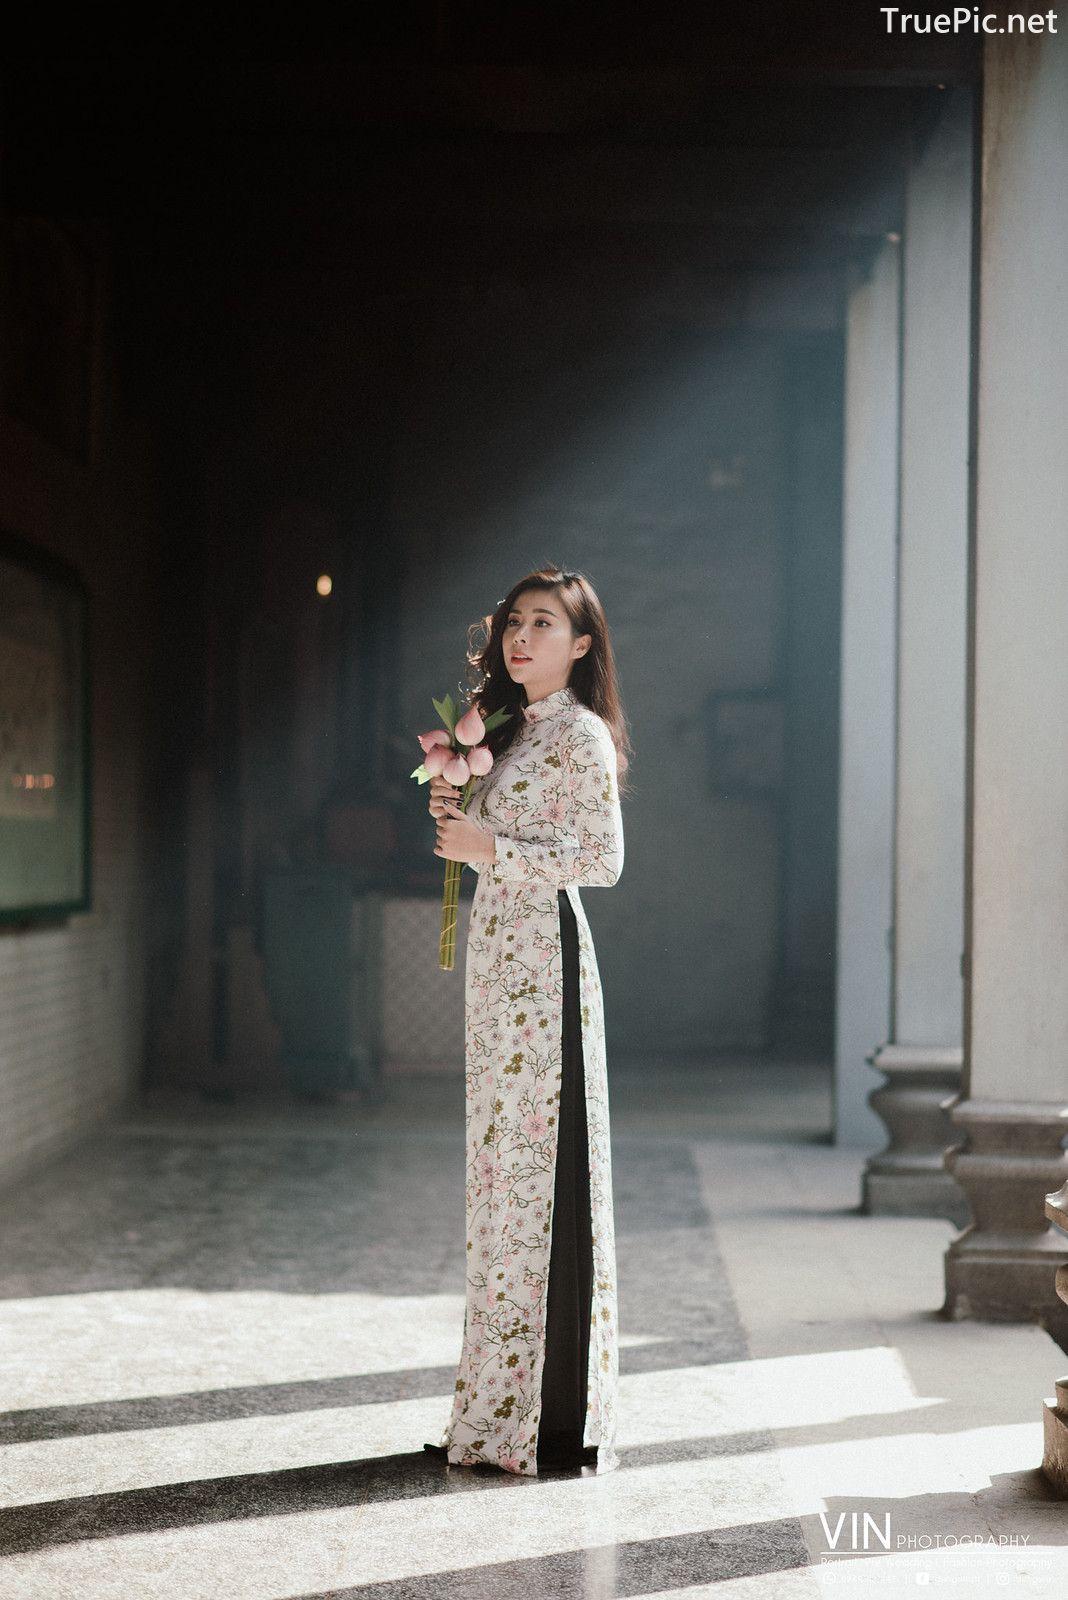 Image-Vietnamese-Beautiful-Girl-Ao-Dai-Vietnam-Traditional-Dress-by-VIN-Photo-3-TruePic.net- Picture-5